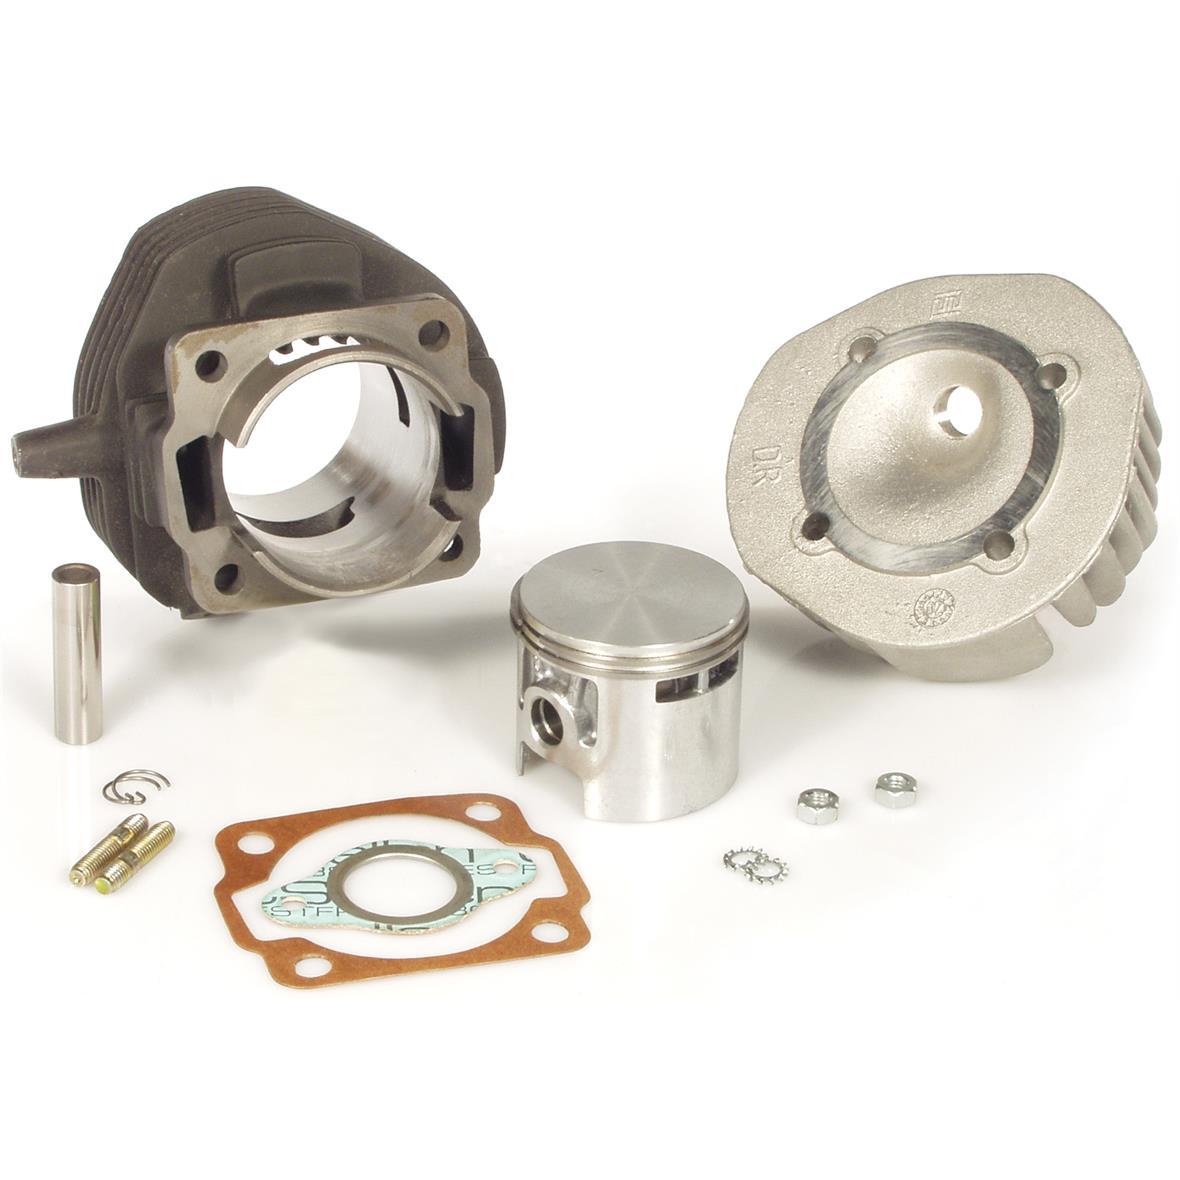 Zdjęcie produktu dla 'Cylinder rajdowy D.R. 102 ccmTitle'